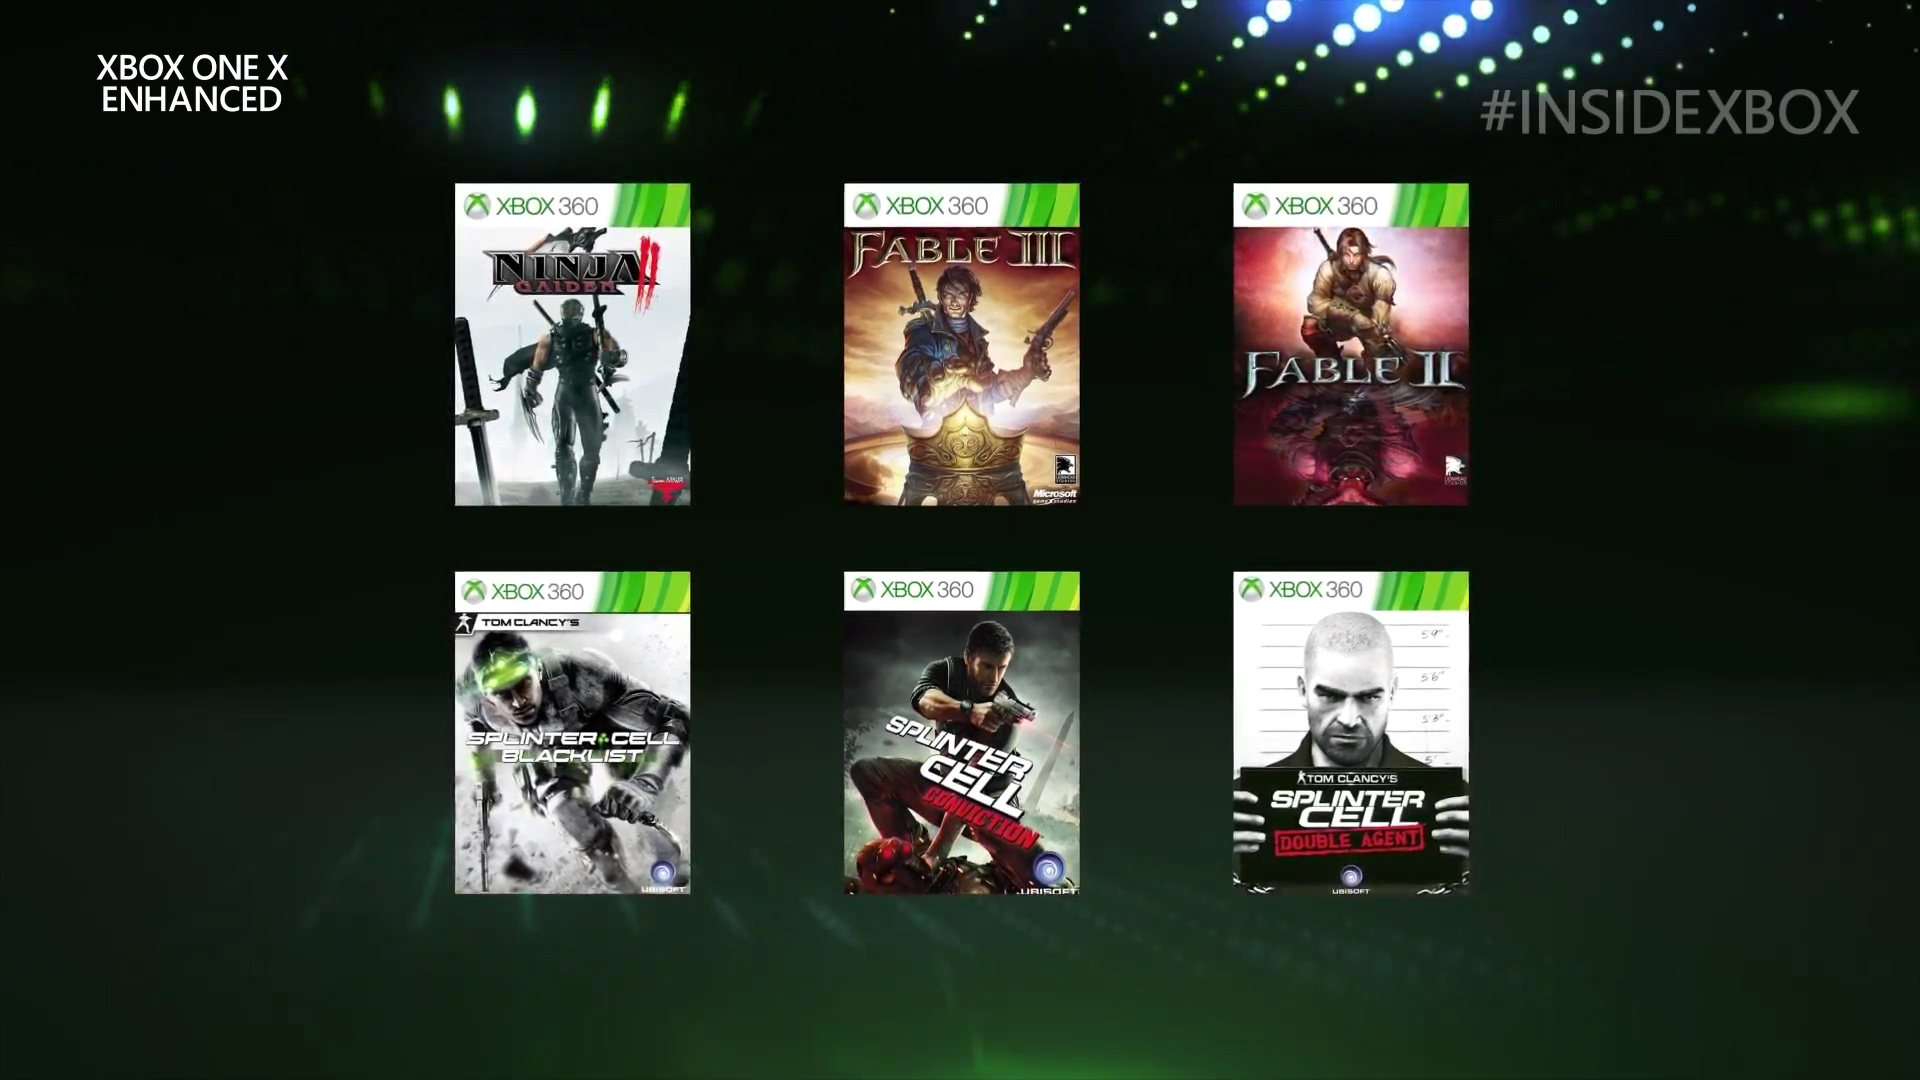 Ninja Gaiden II is out for revenge on Xbox One screenshot